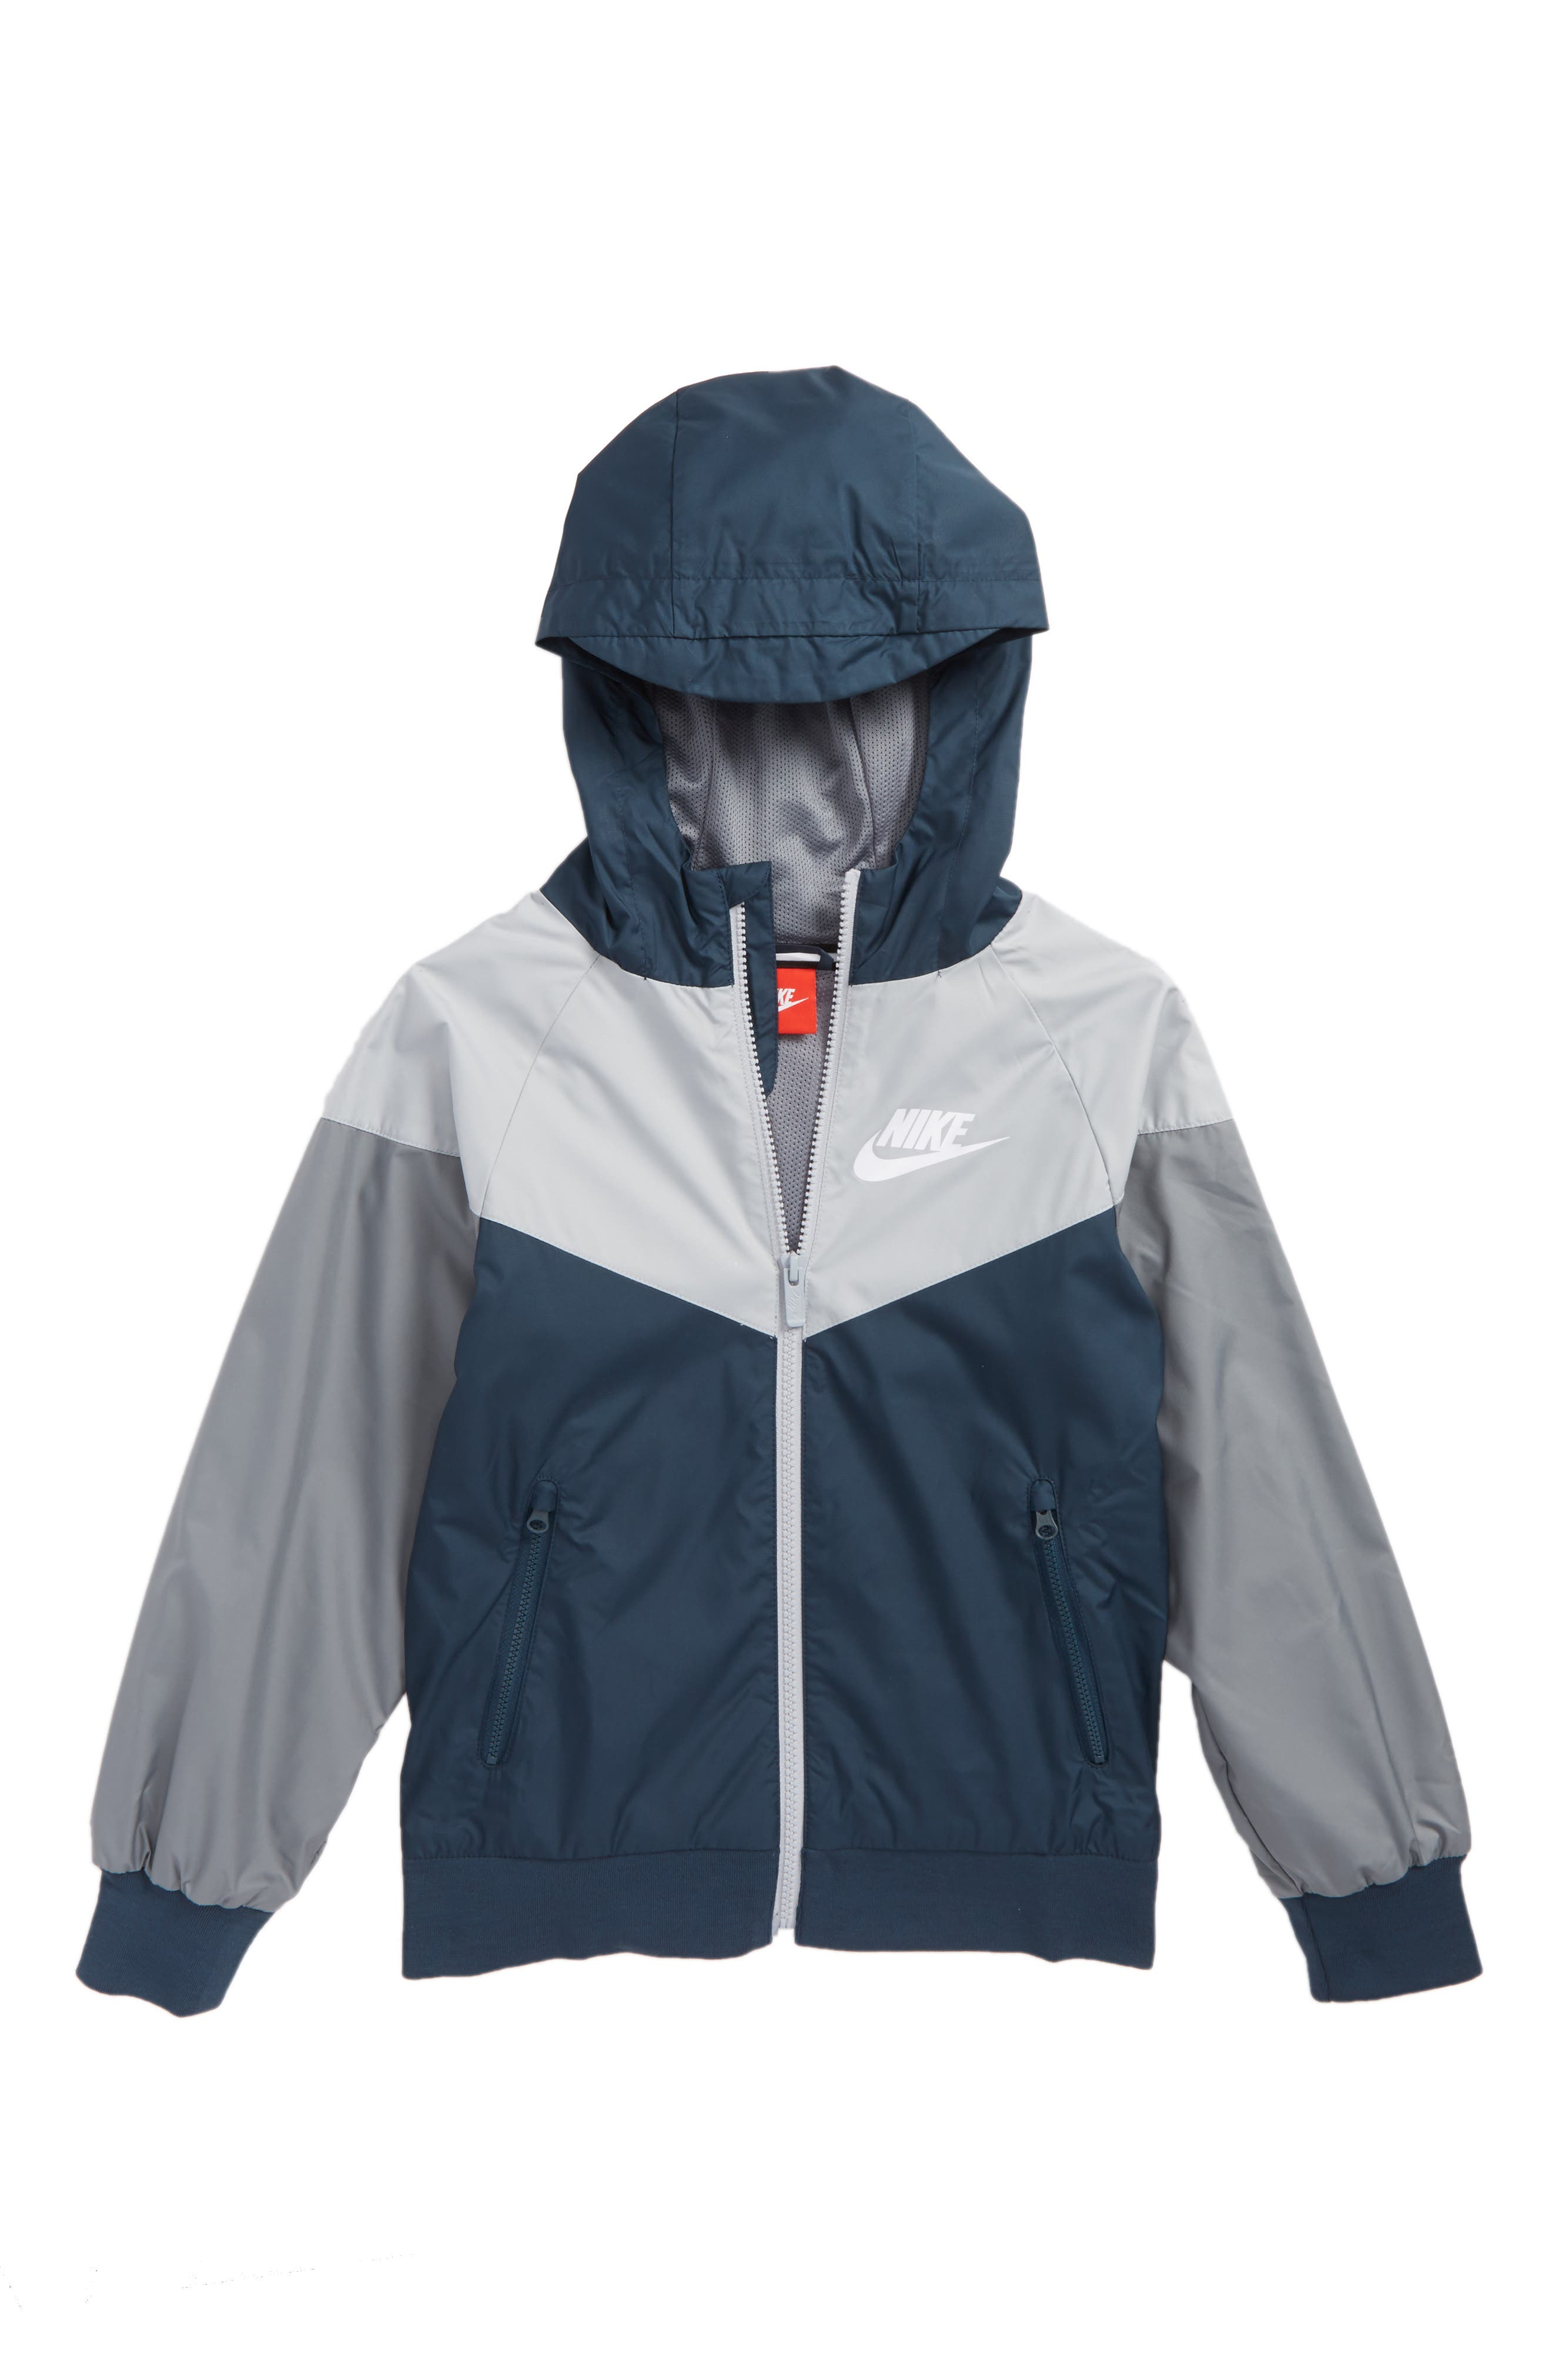 Alternate Image 1 Selected - Nike Windrunner Water Resistant Hooded Jacket (Little Boys & Big Boys)